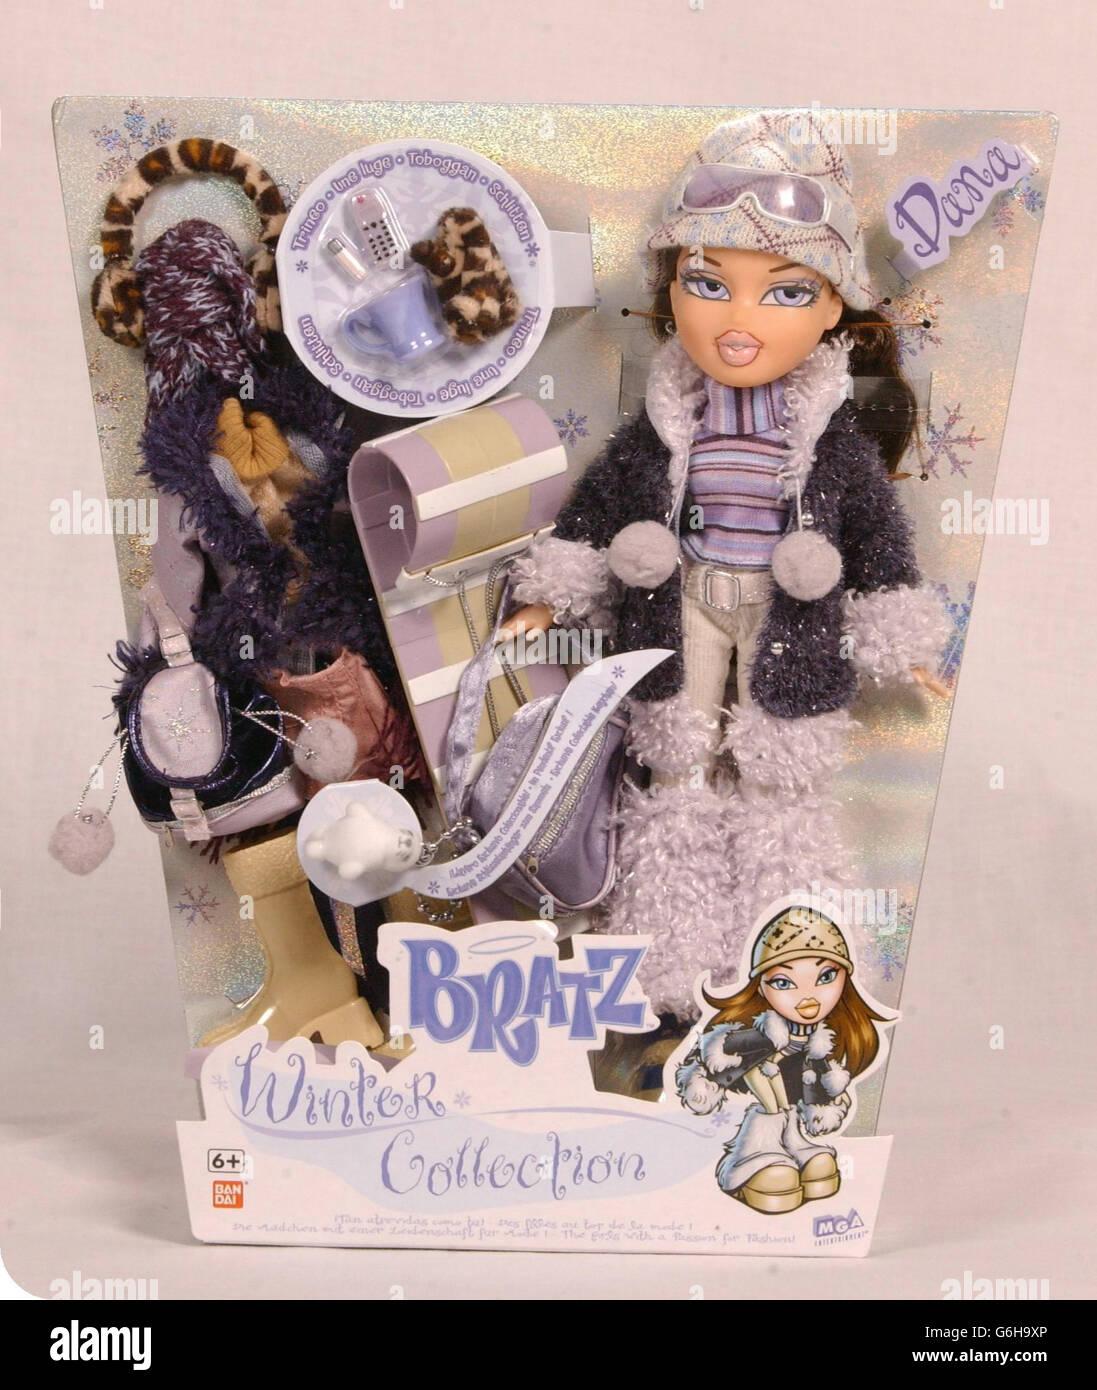 Dream Toys 2003 - Stock Image